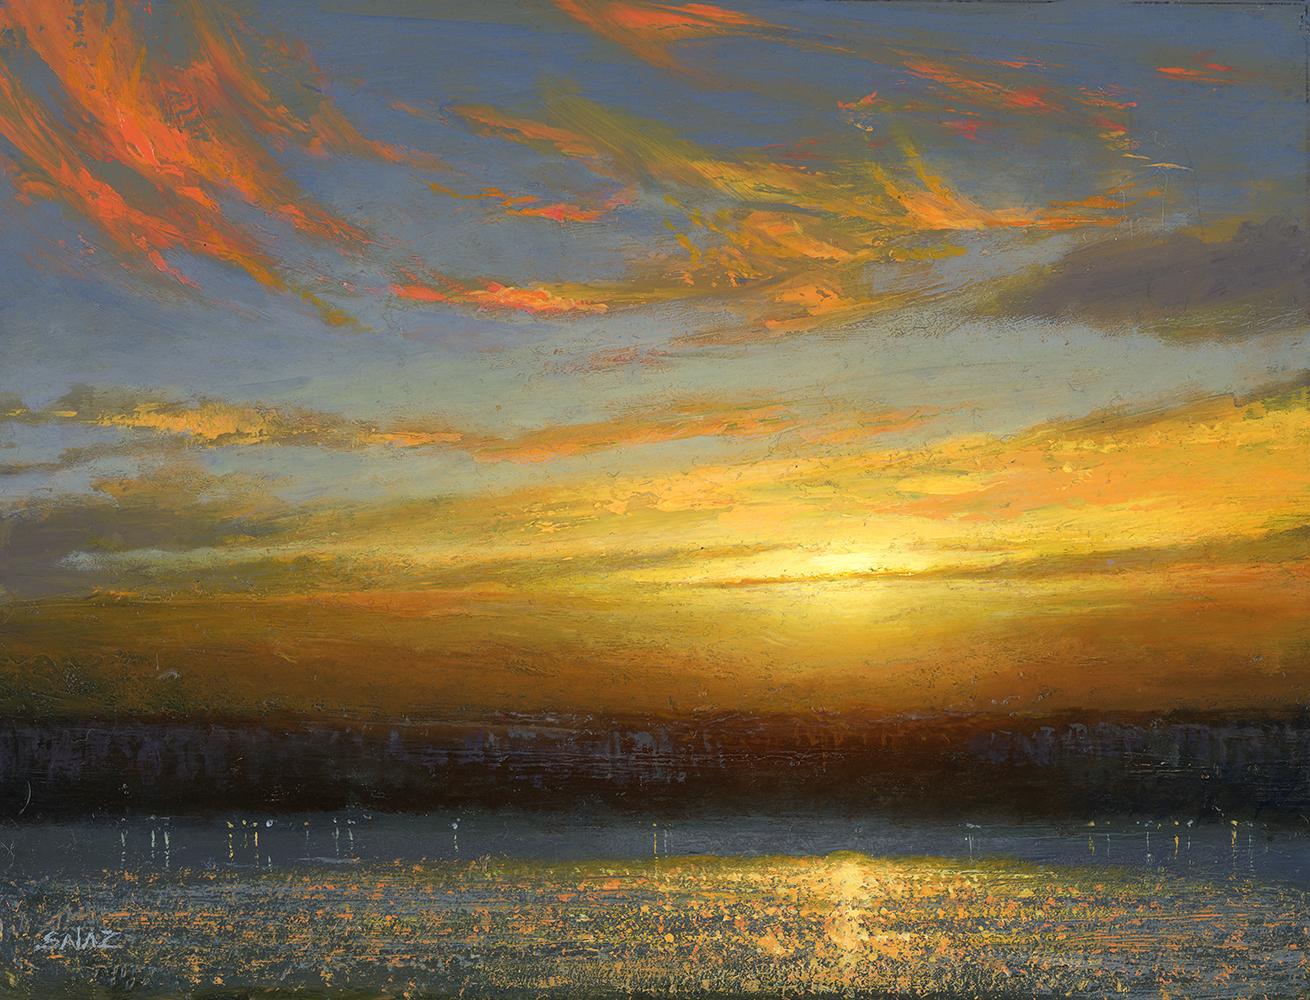 ken_salaz_kws1114_sunset_over_palisades.jpg